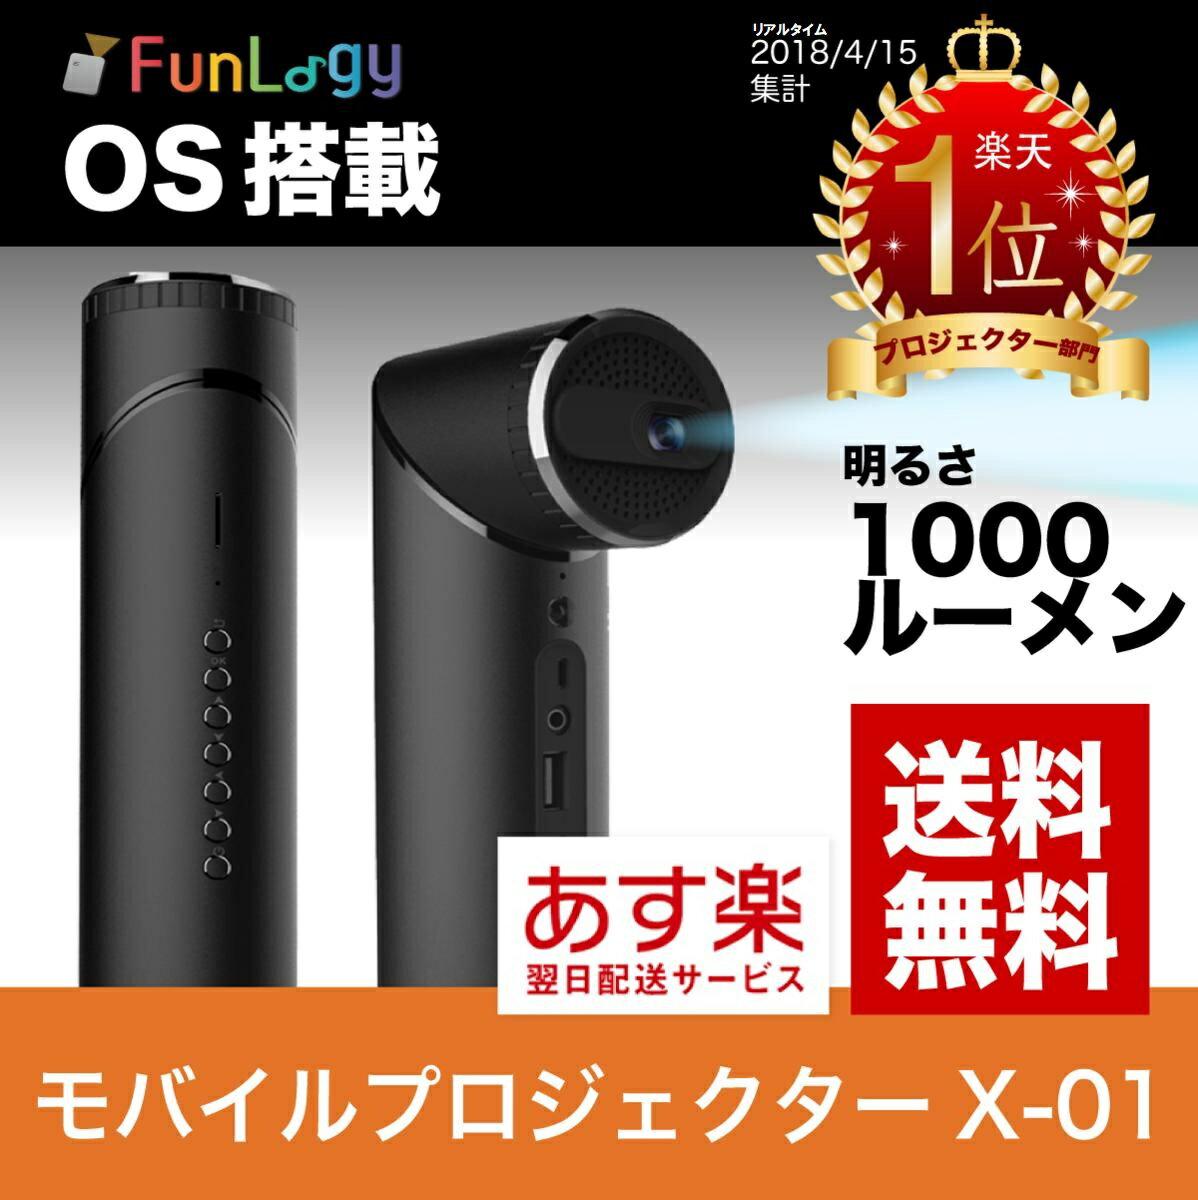 FunLogy モバイルプロジェクター 小型 プロジェクター wifi DLP iphone android iOS11対応【FunLogy モバイルプロジェクター X-01 】